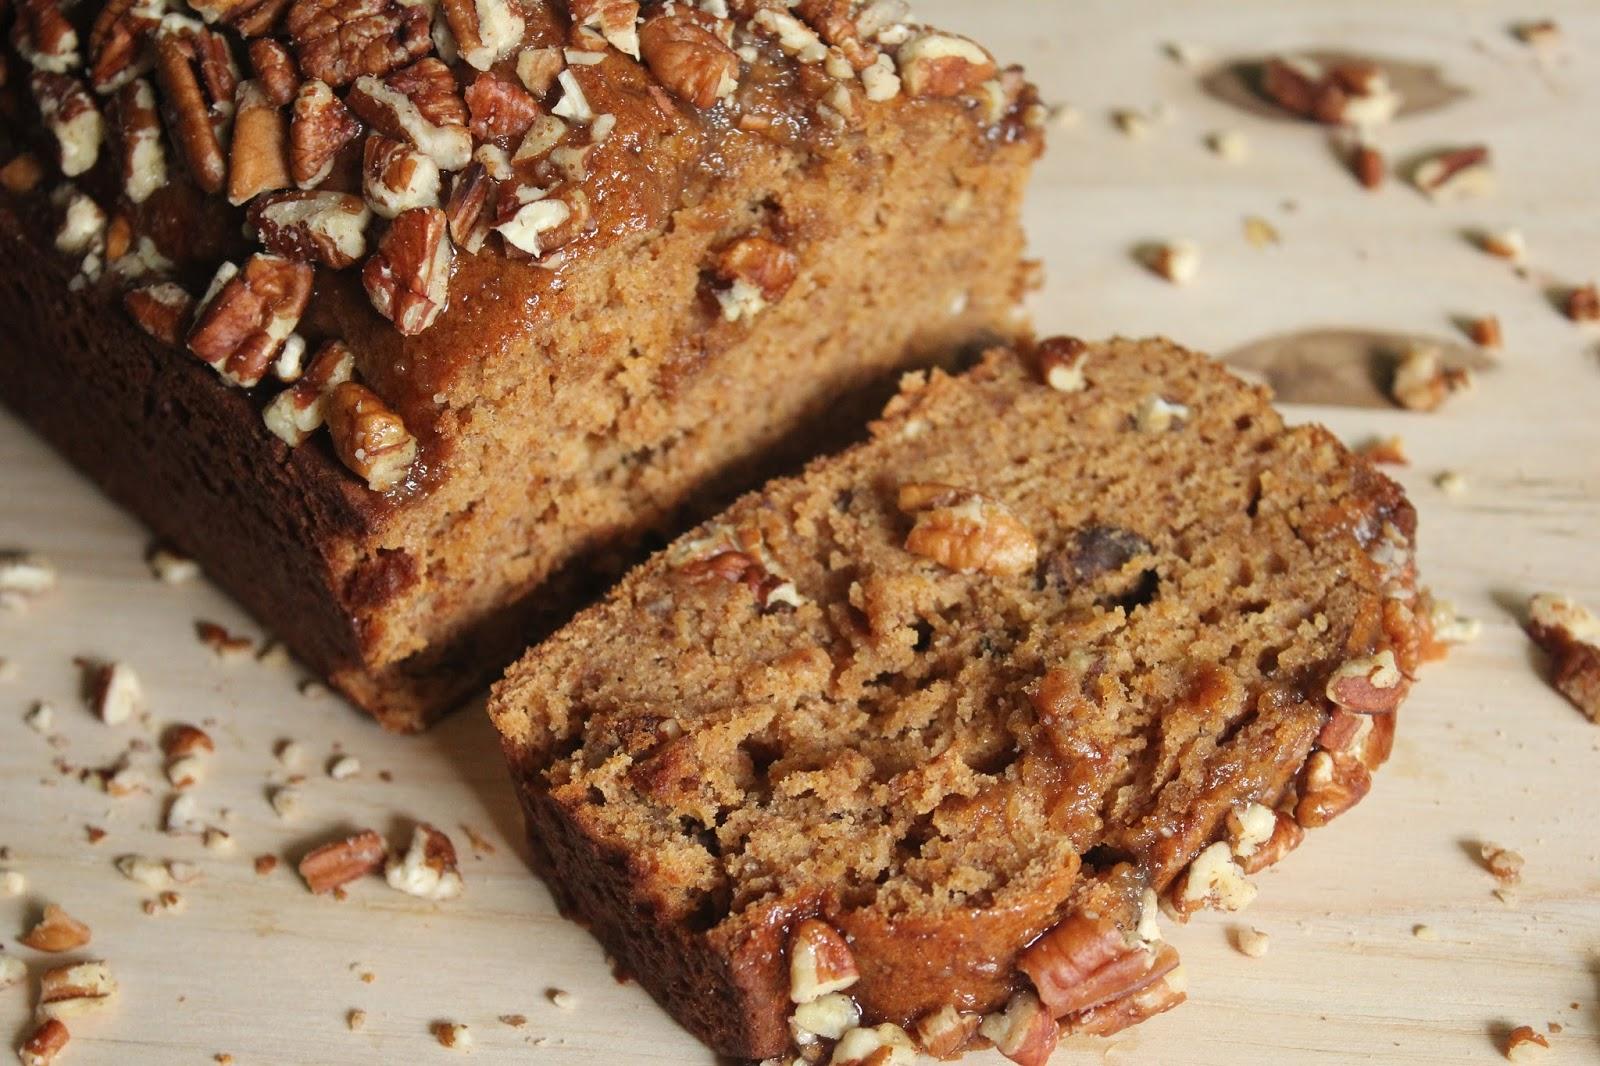 Holiday Cookbook - Thanksgiving Dessert Recipe: Pumpkin Pecan Bread with Vanilla & Brown Sugar Glaze